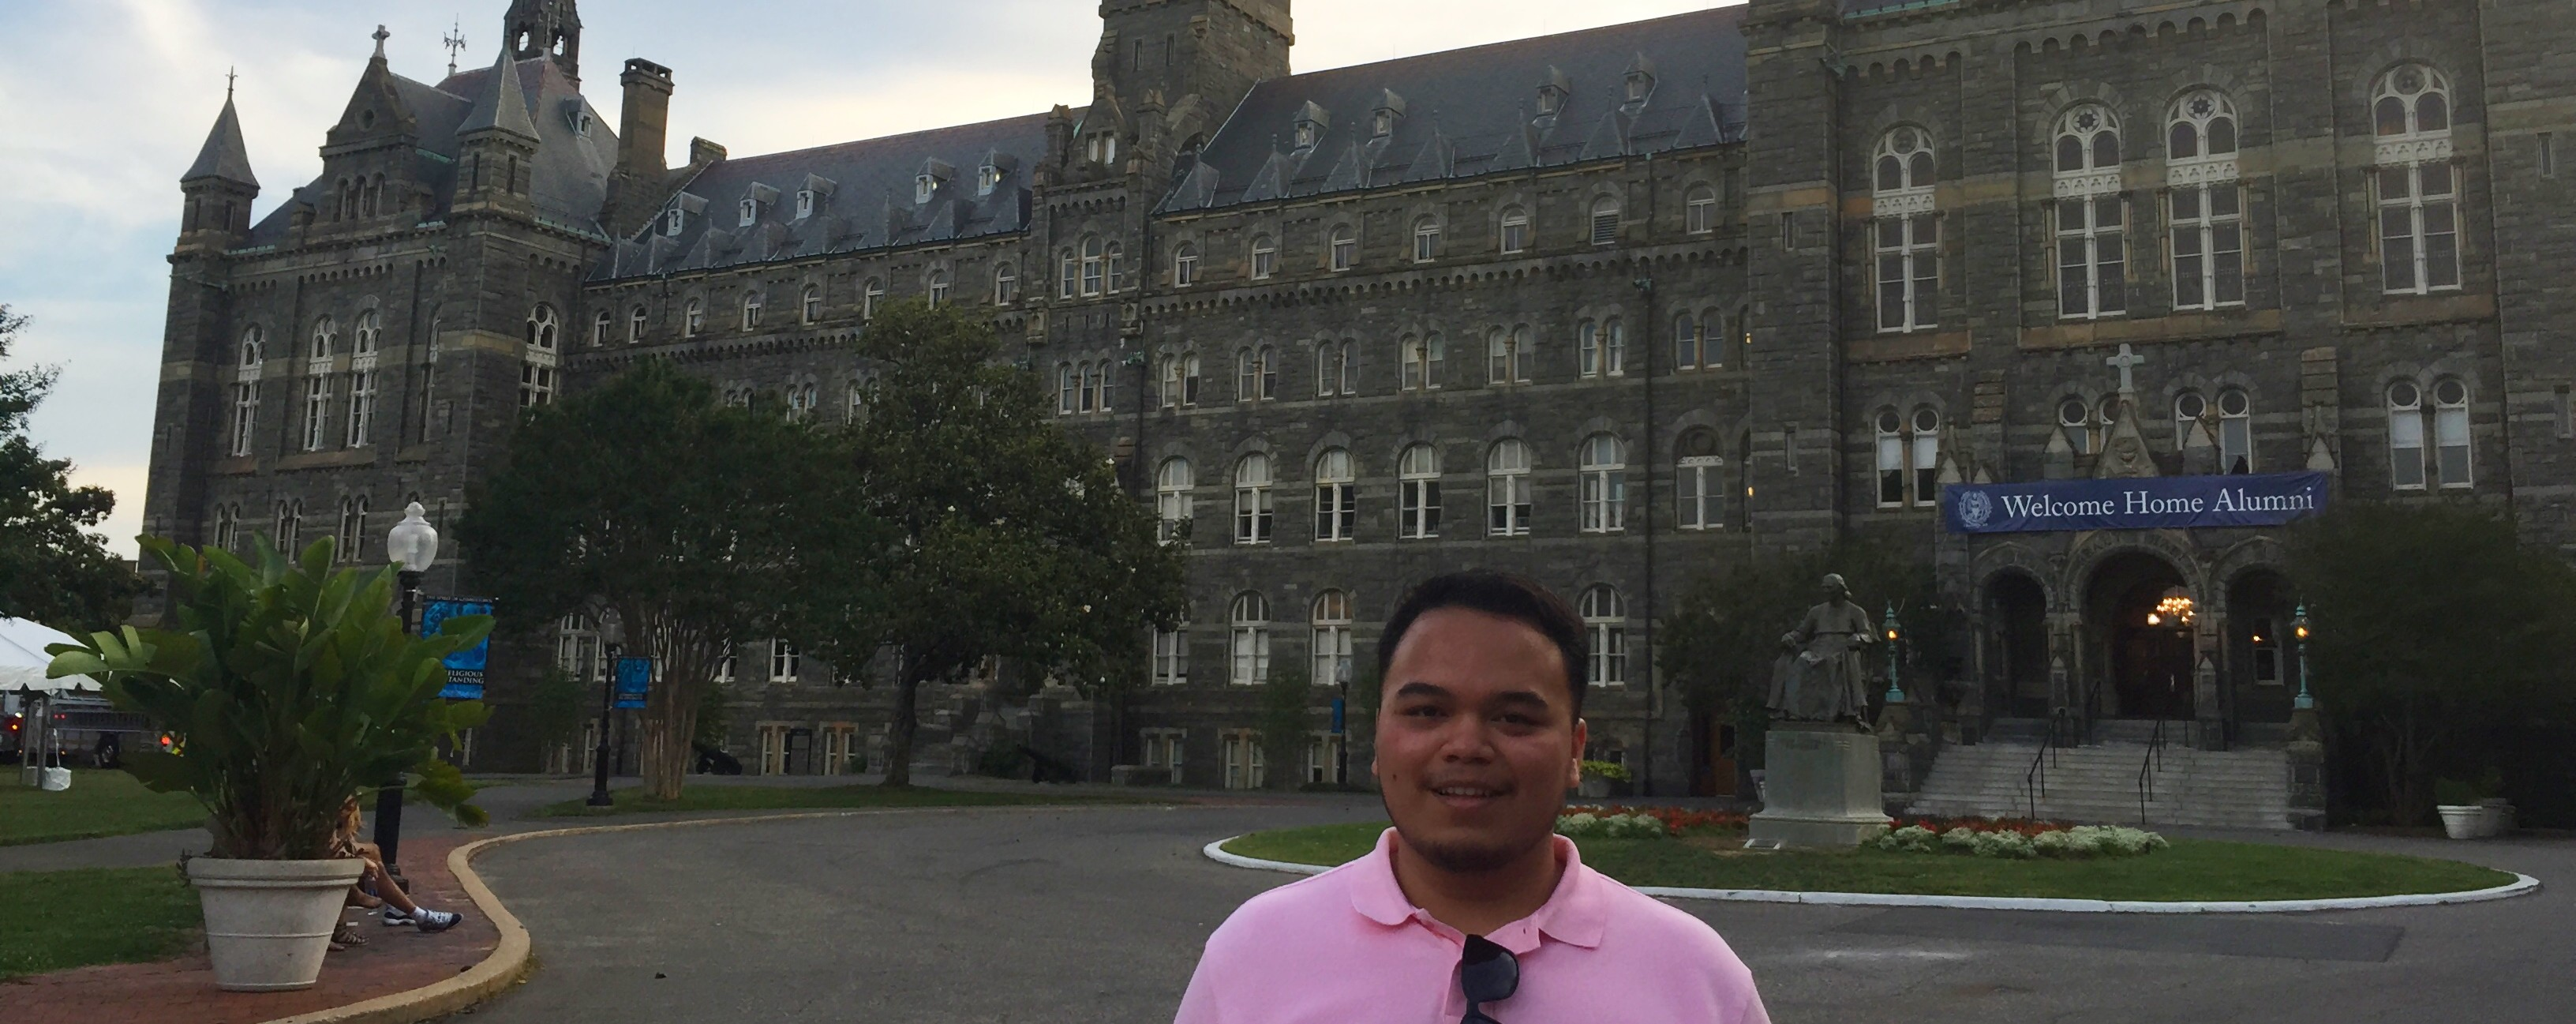 Menjalani Jalan Yang Tidak Biasa di Georgetown University, Qatar